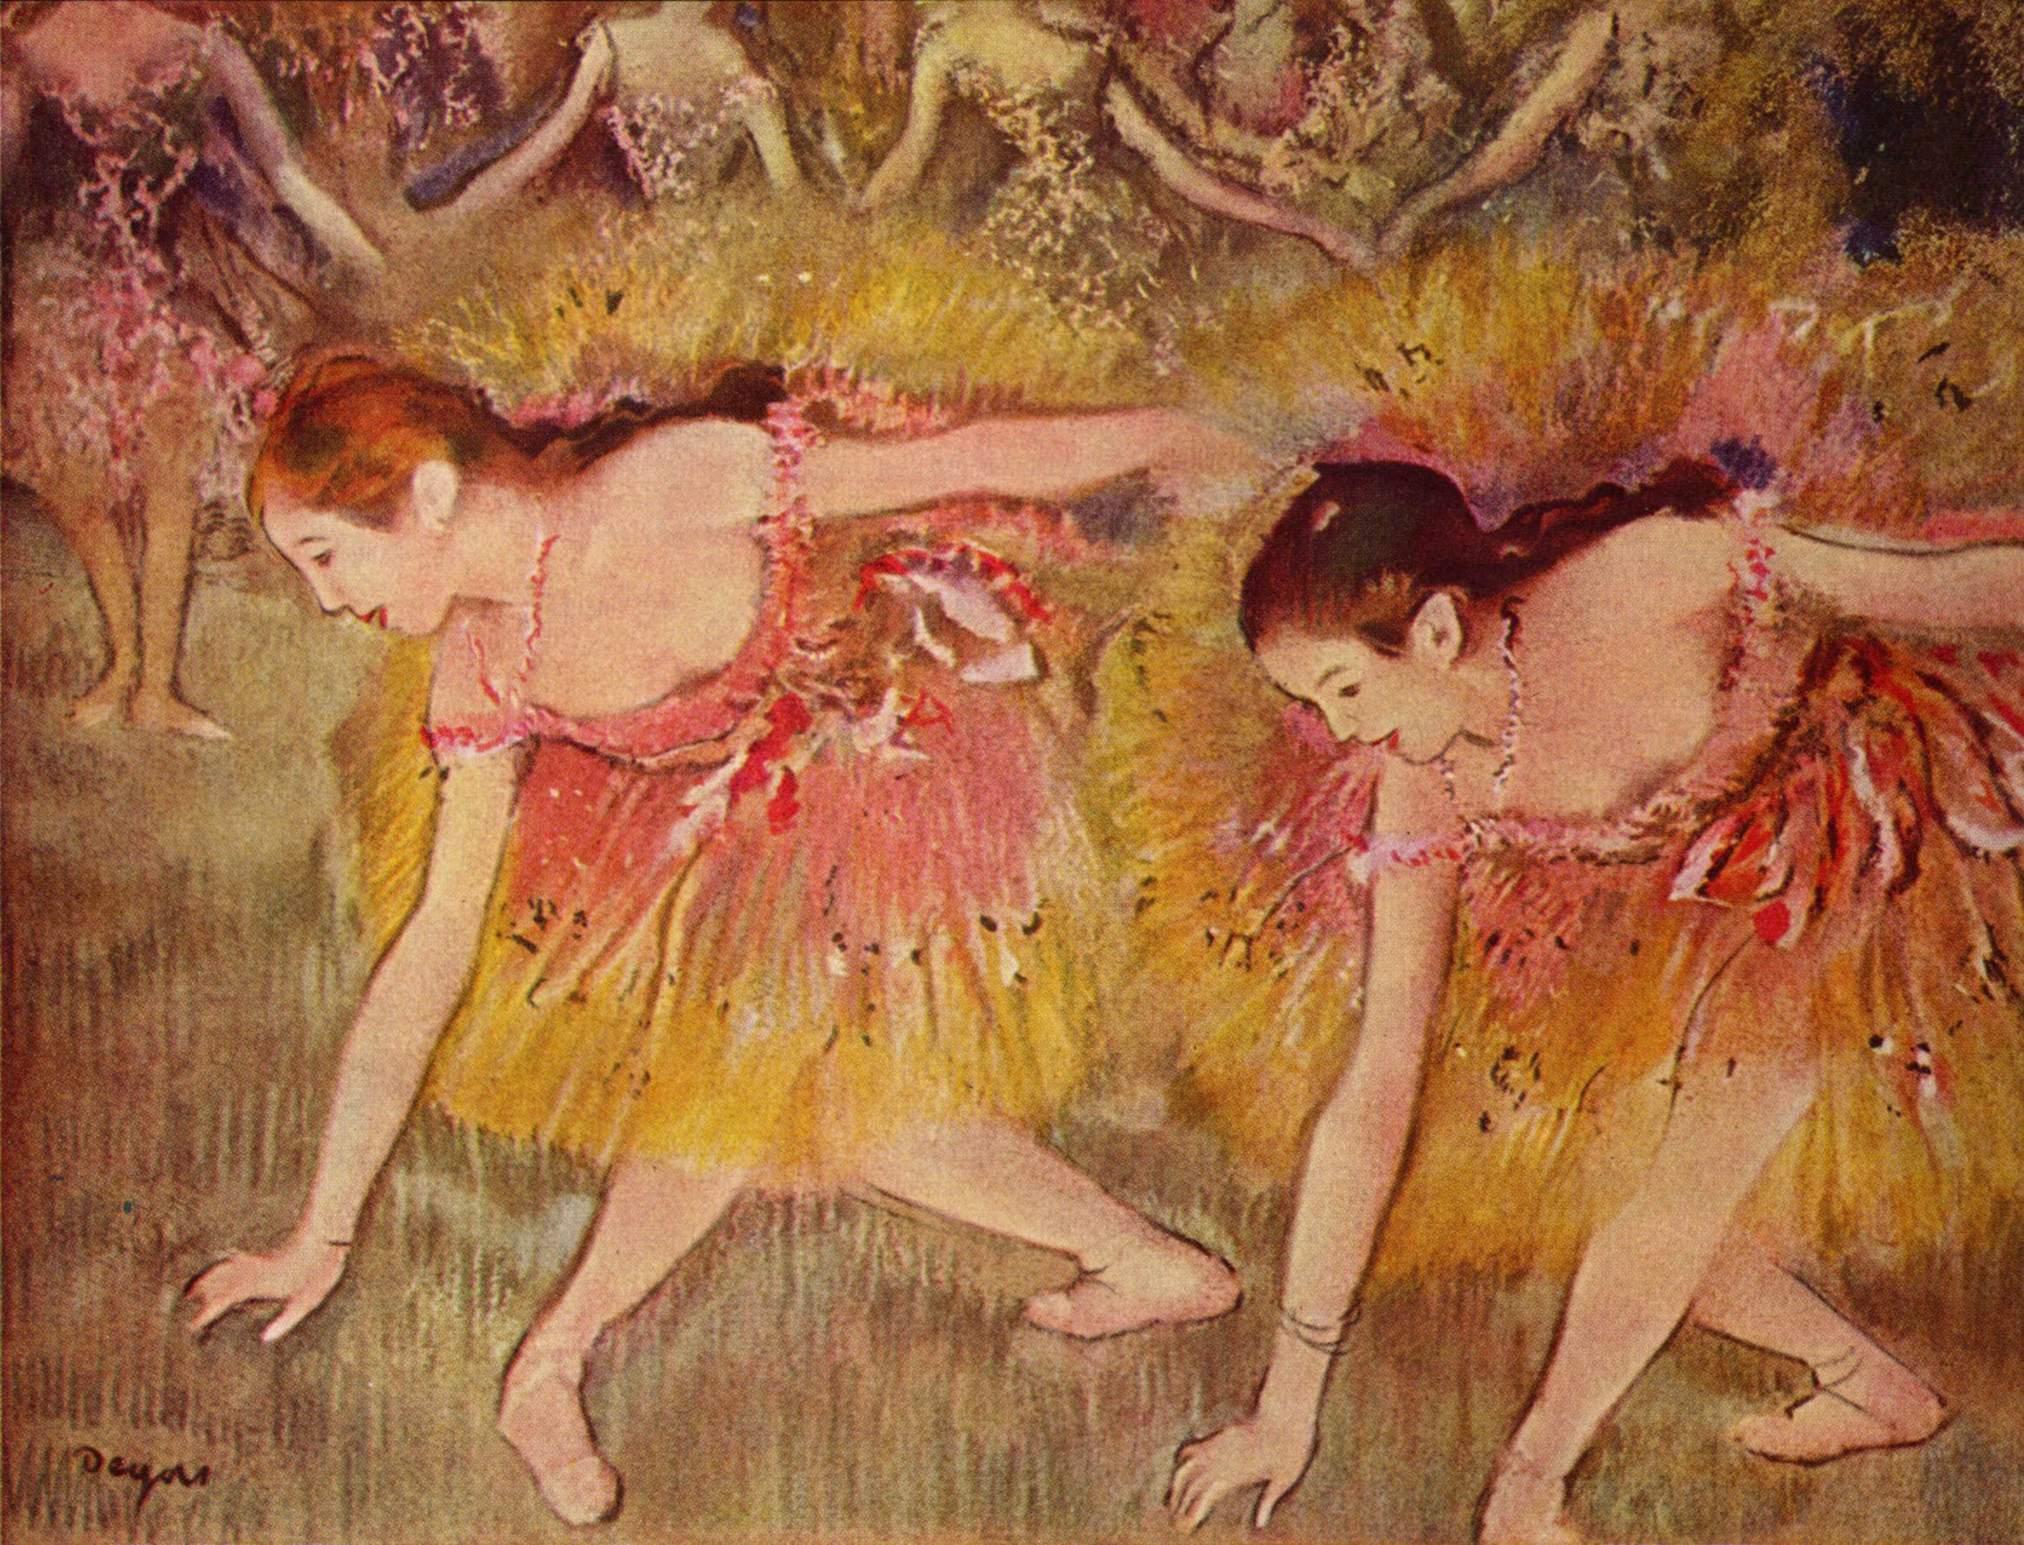 Dancers Bending Down, 1885 - Edgar Degas - WikiArt.org